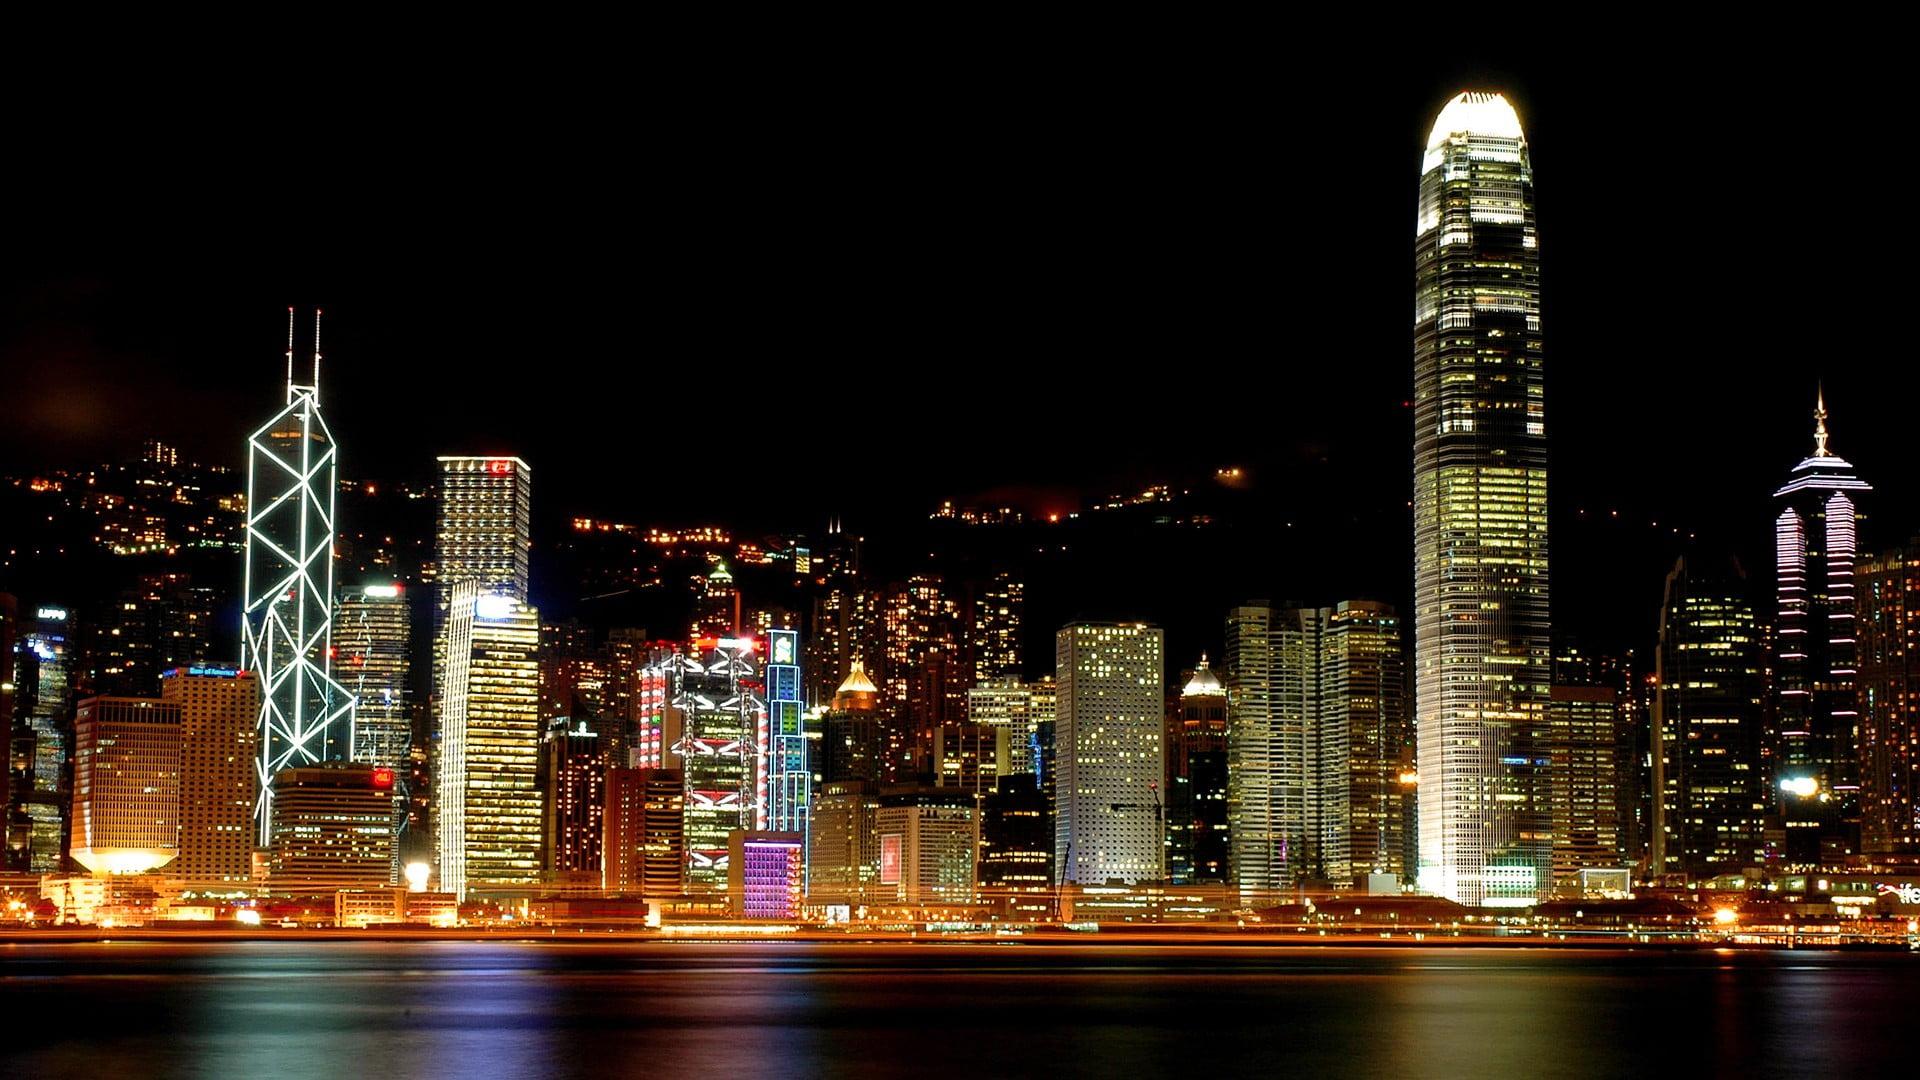 skyline-night-victoria-harbour-hong-kong-wallpaper